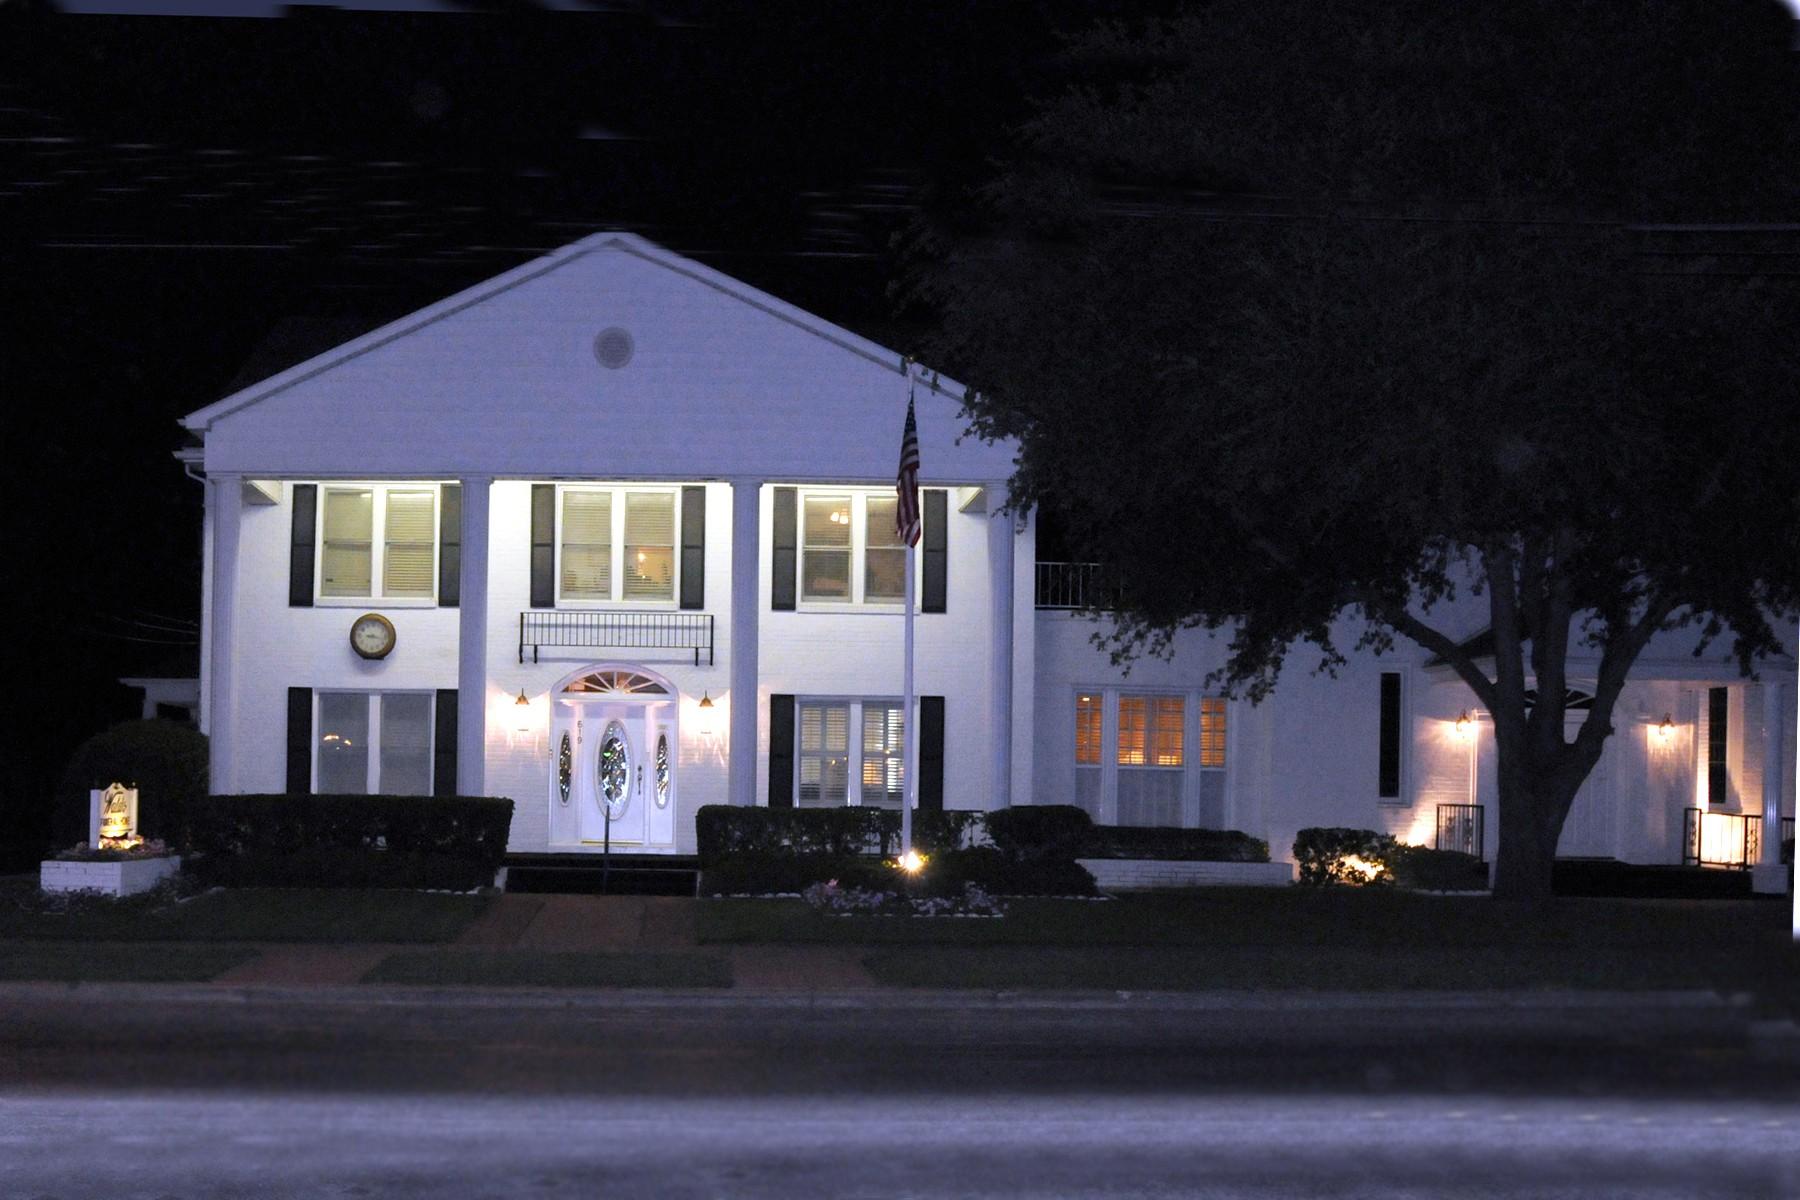 Waldo Funeral Home image 2